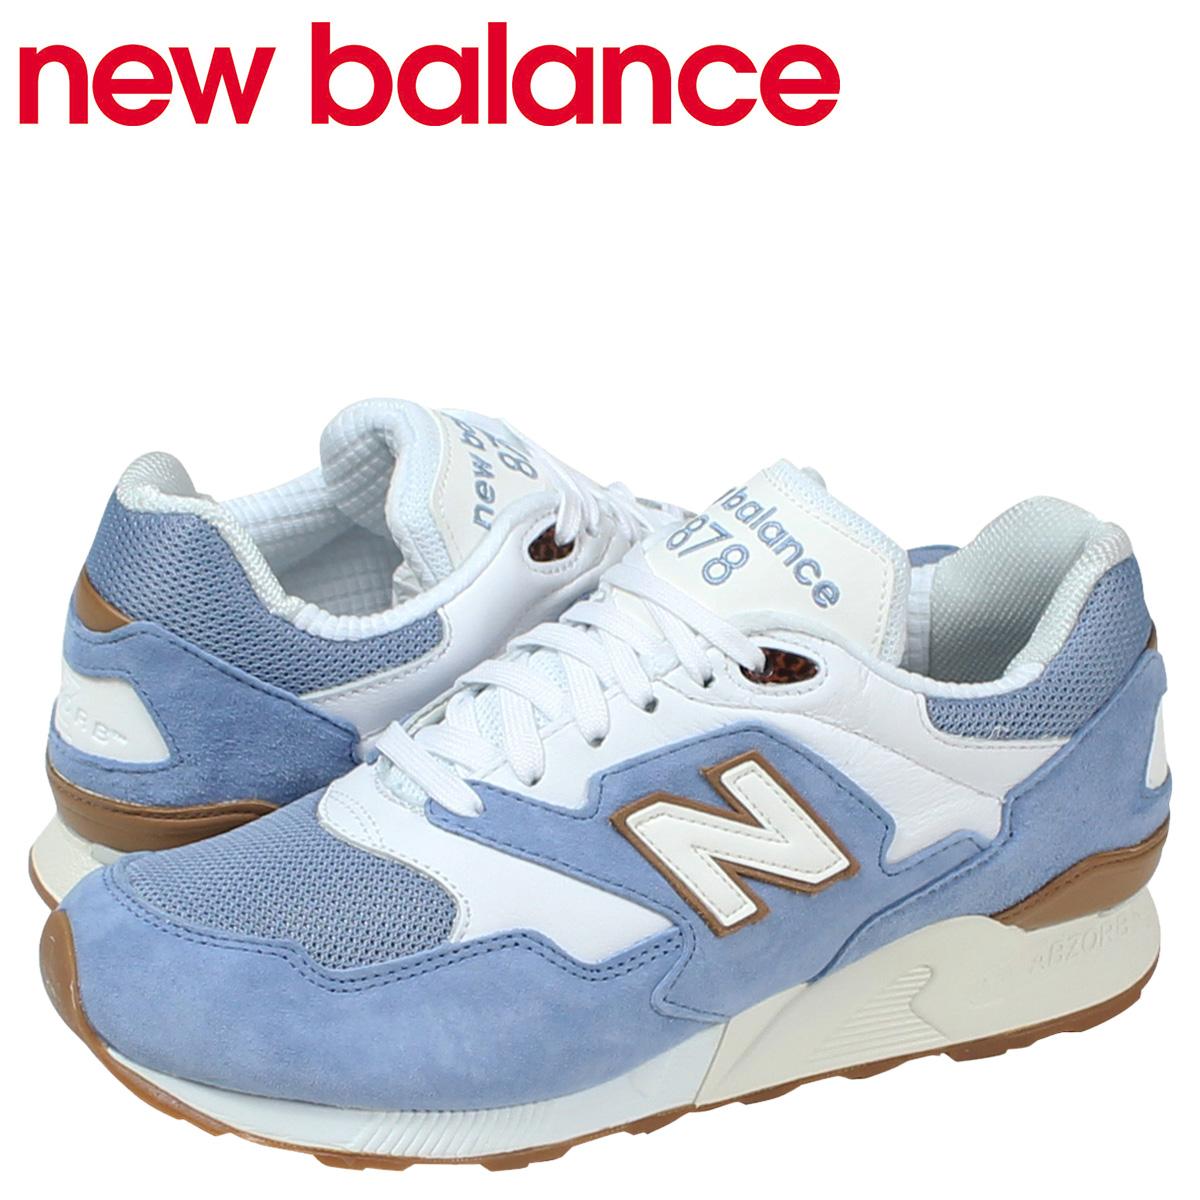 new balance 878